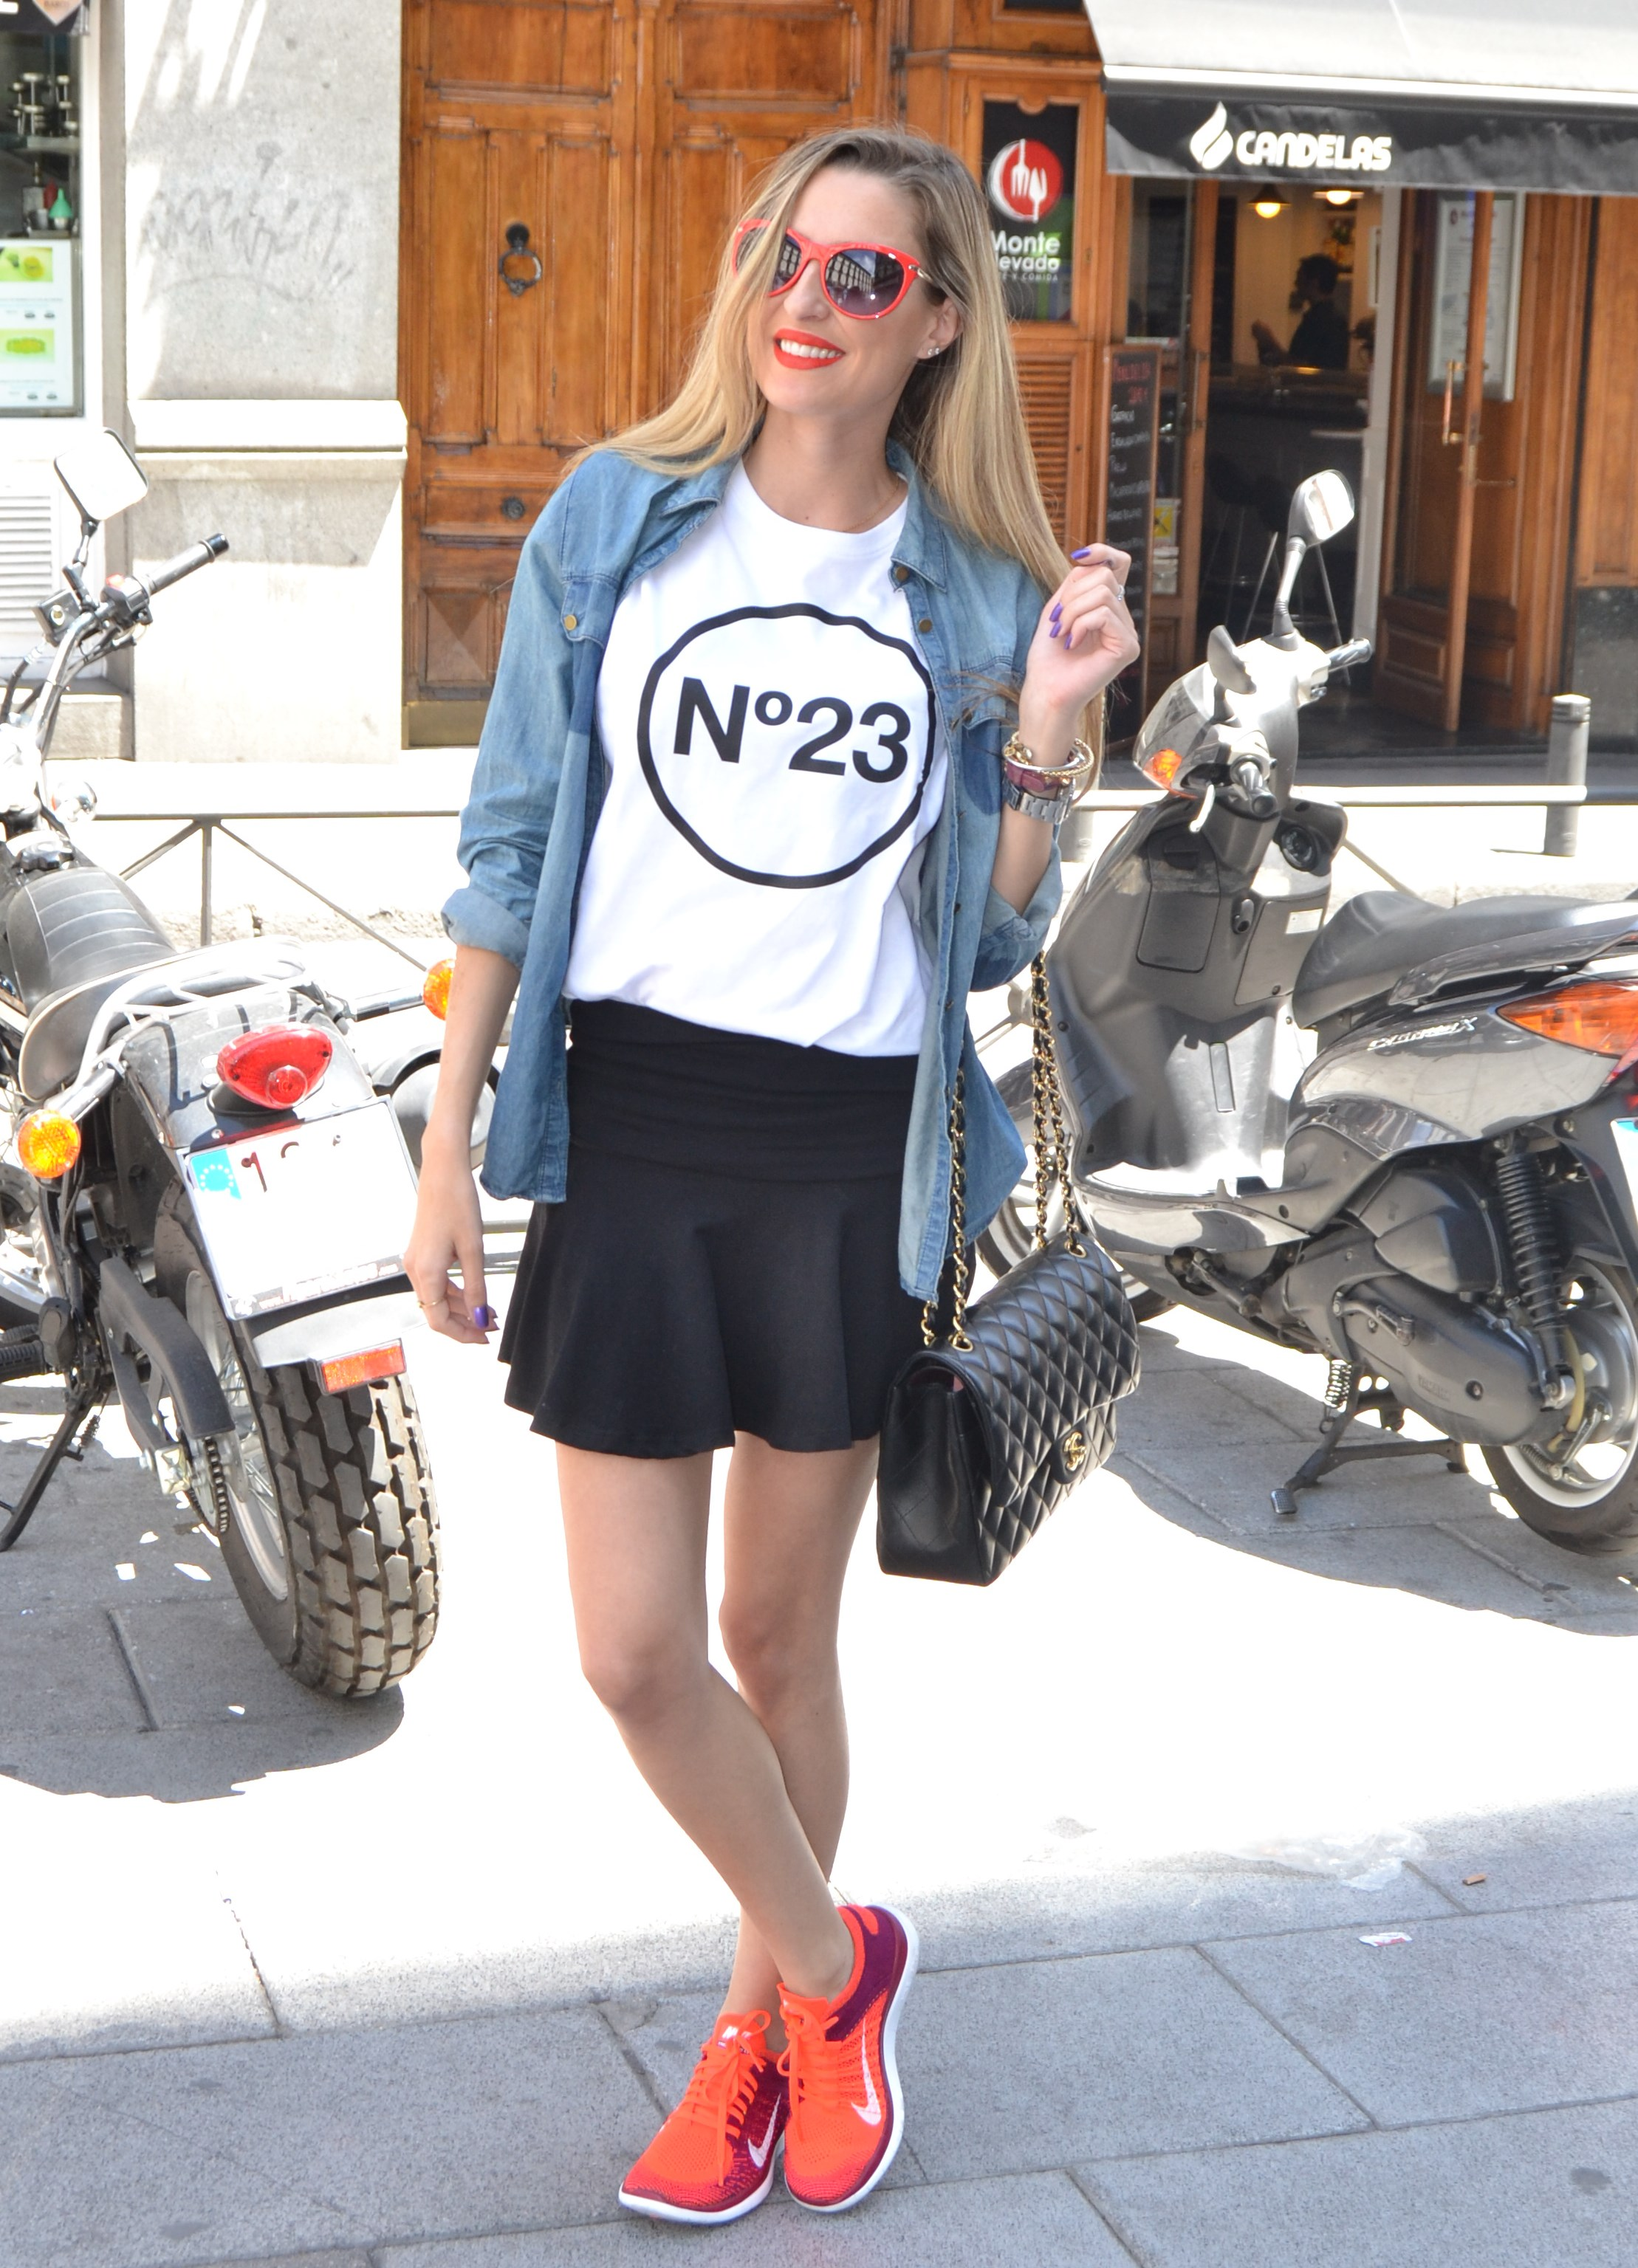 Nike_Free_FlyKnight_Sneakers_Chanel_255_Chanel_Bag_Guess_Sunglasses_Denim_Shirt_Lara_Martin_Gilarranz_Bymyheels (4)